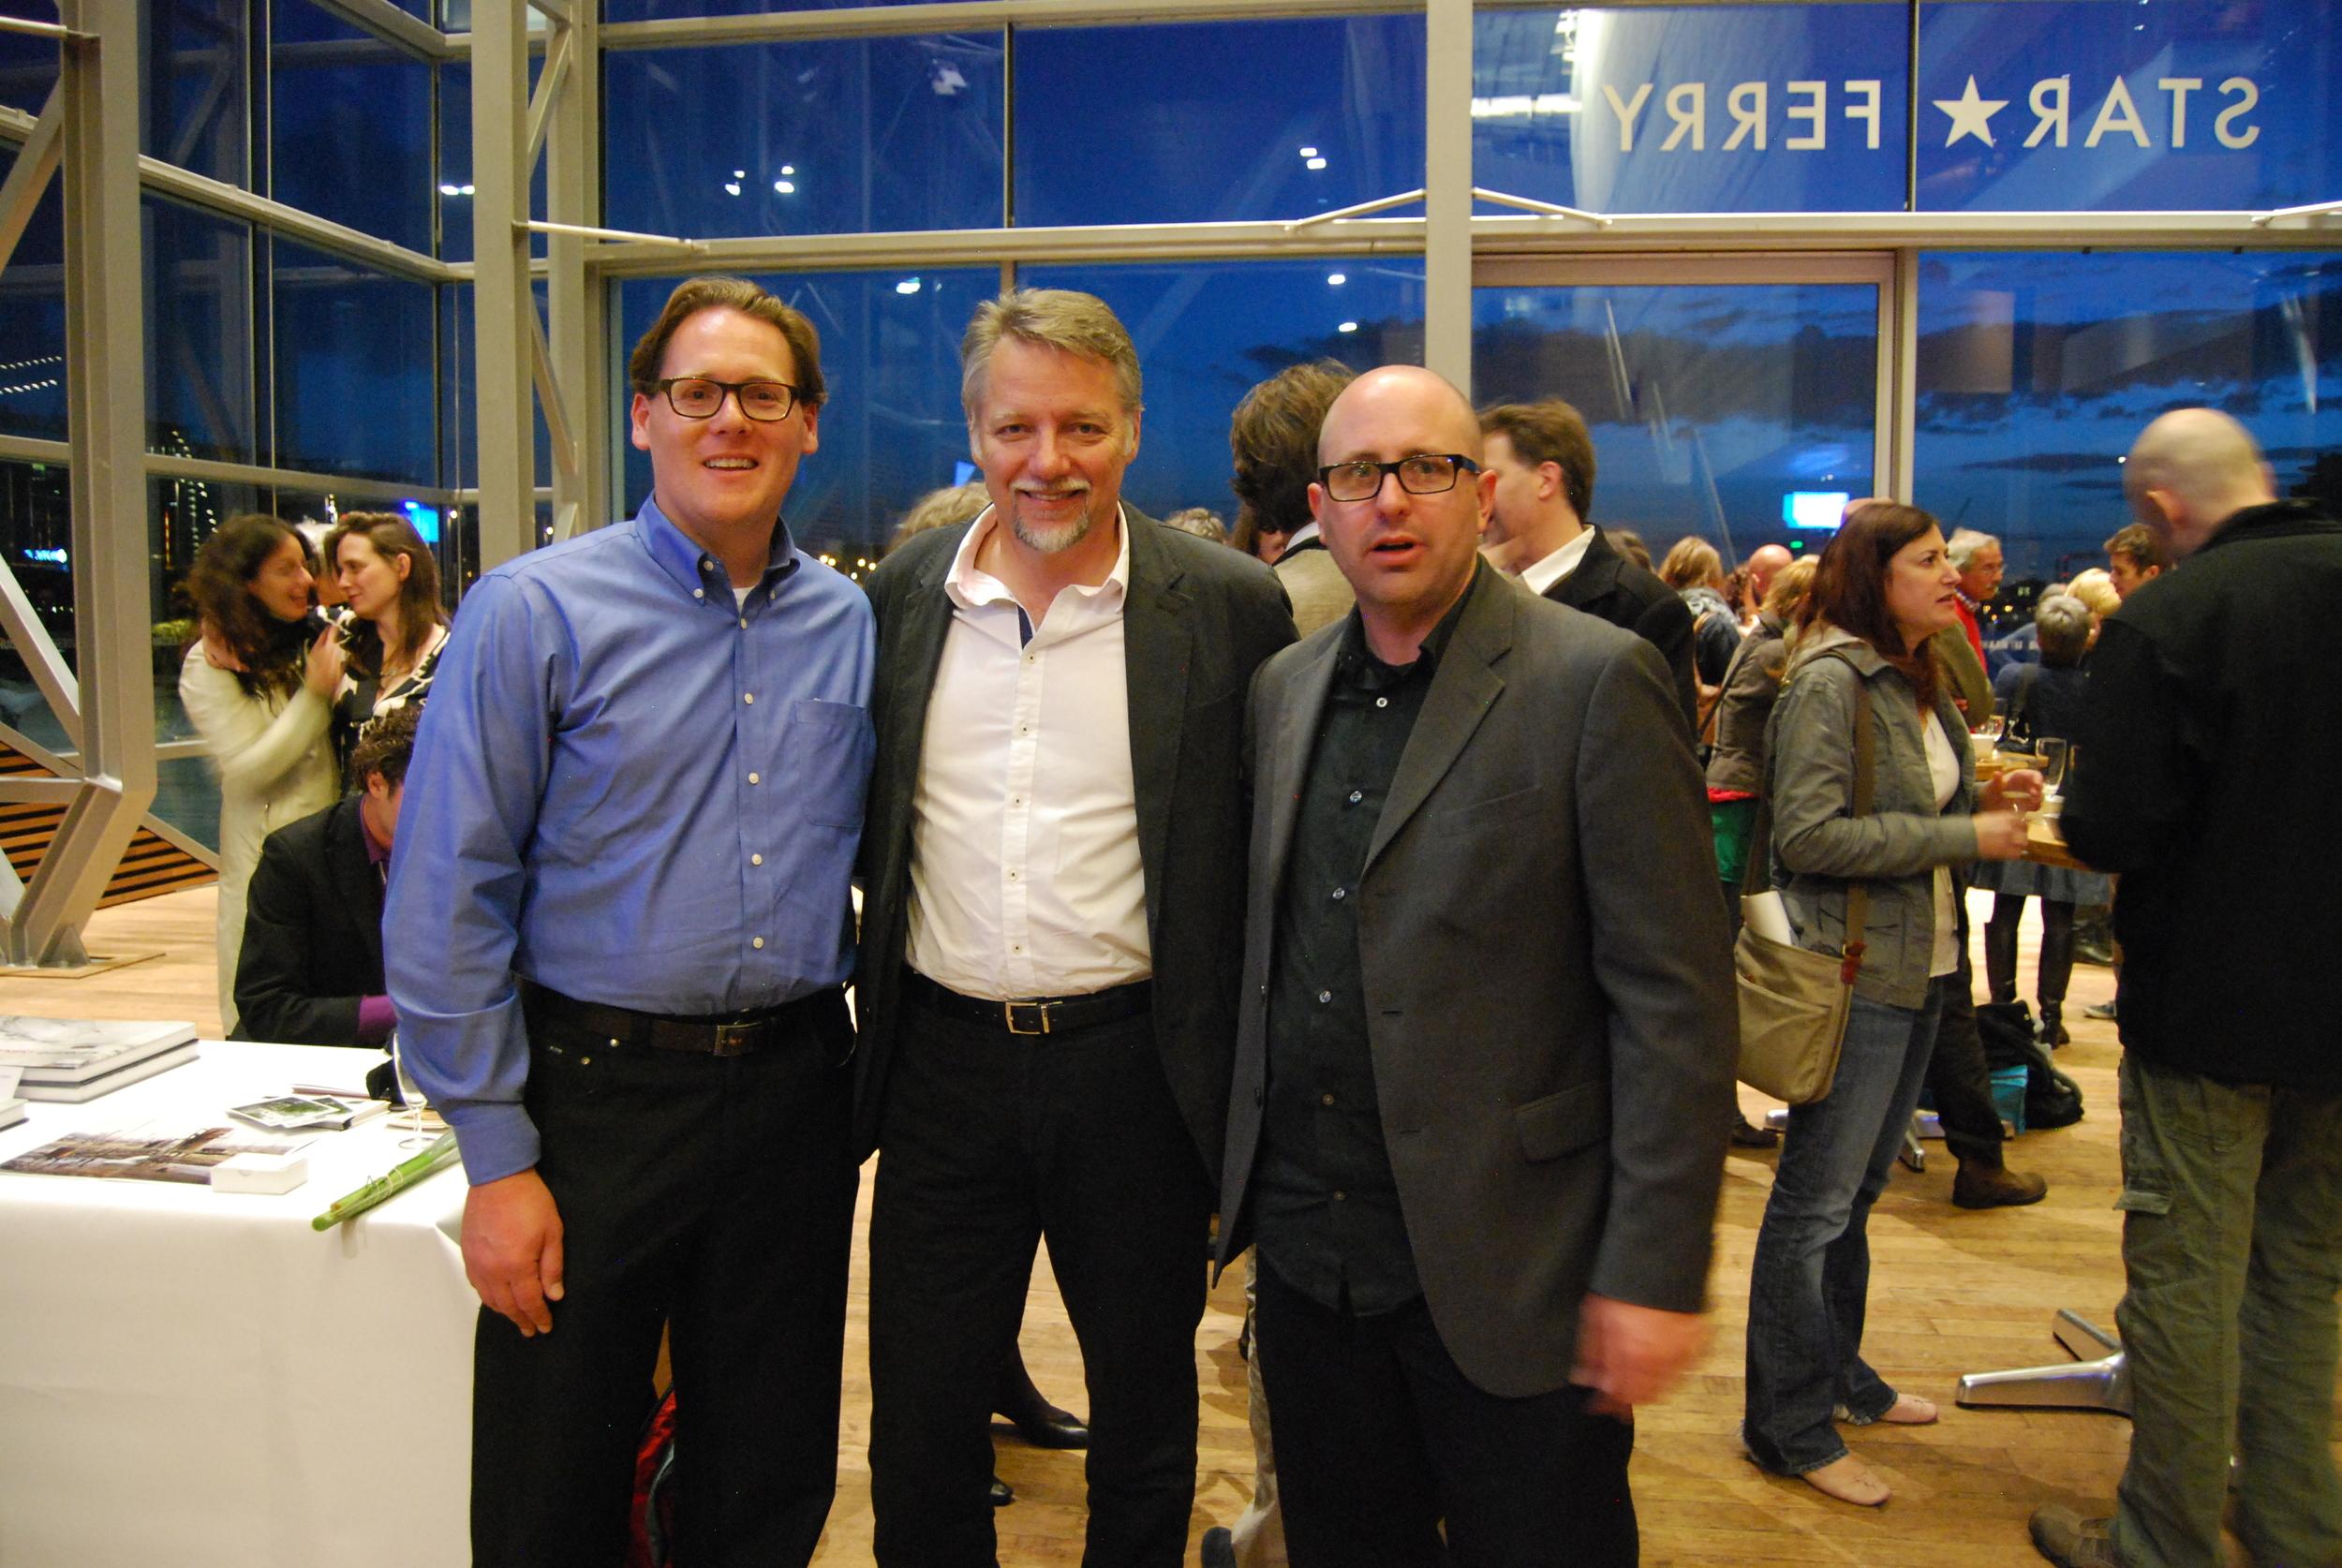 L to R: Stephen Tuttle, Edward Burtynsky, Steven Ricks; WRENCH premiere at Muziekgebouw, AMS, 5.22.11